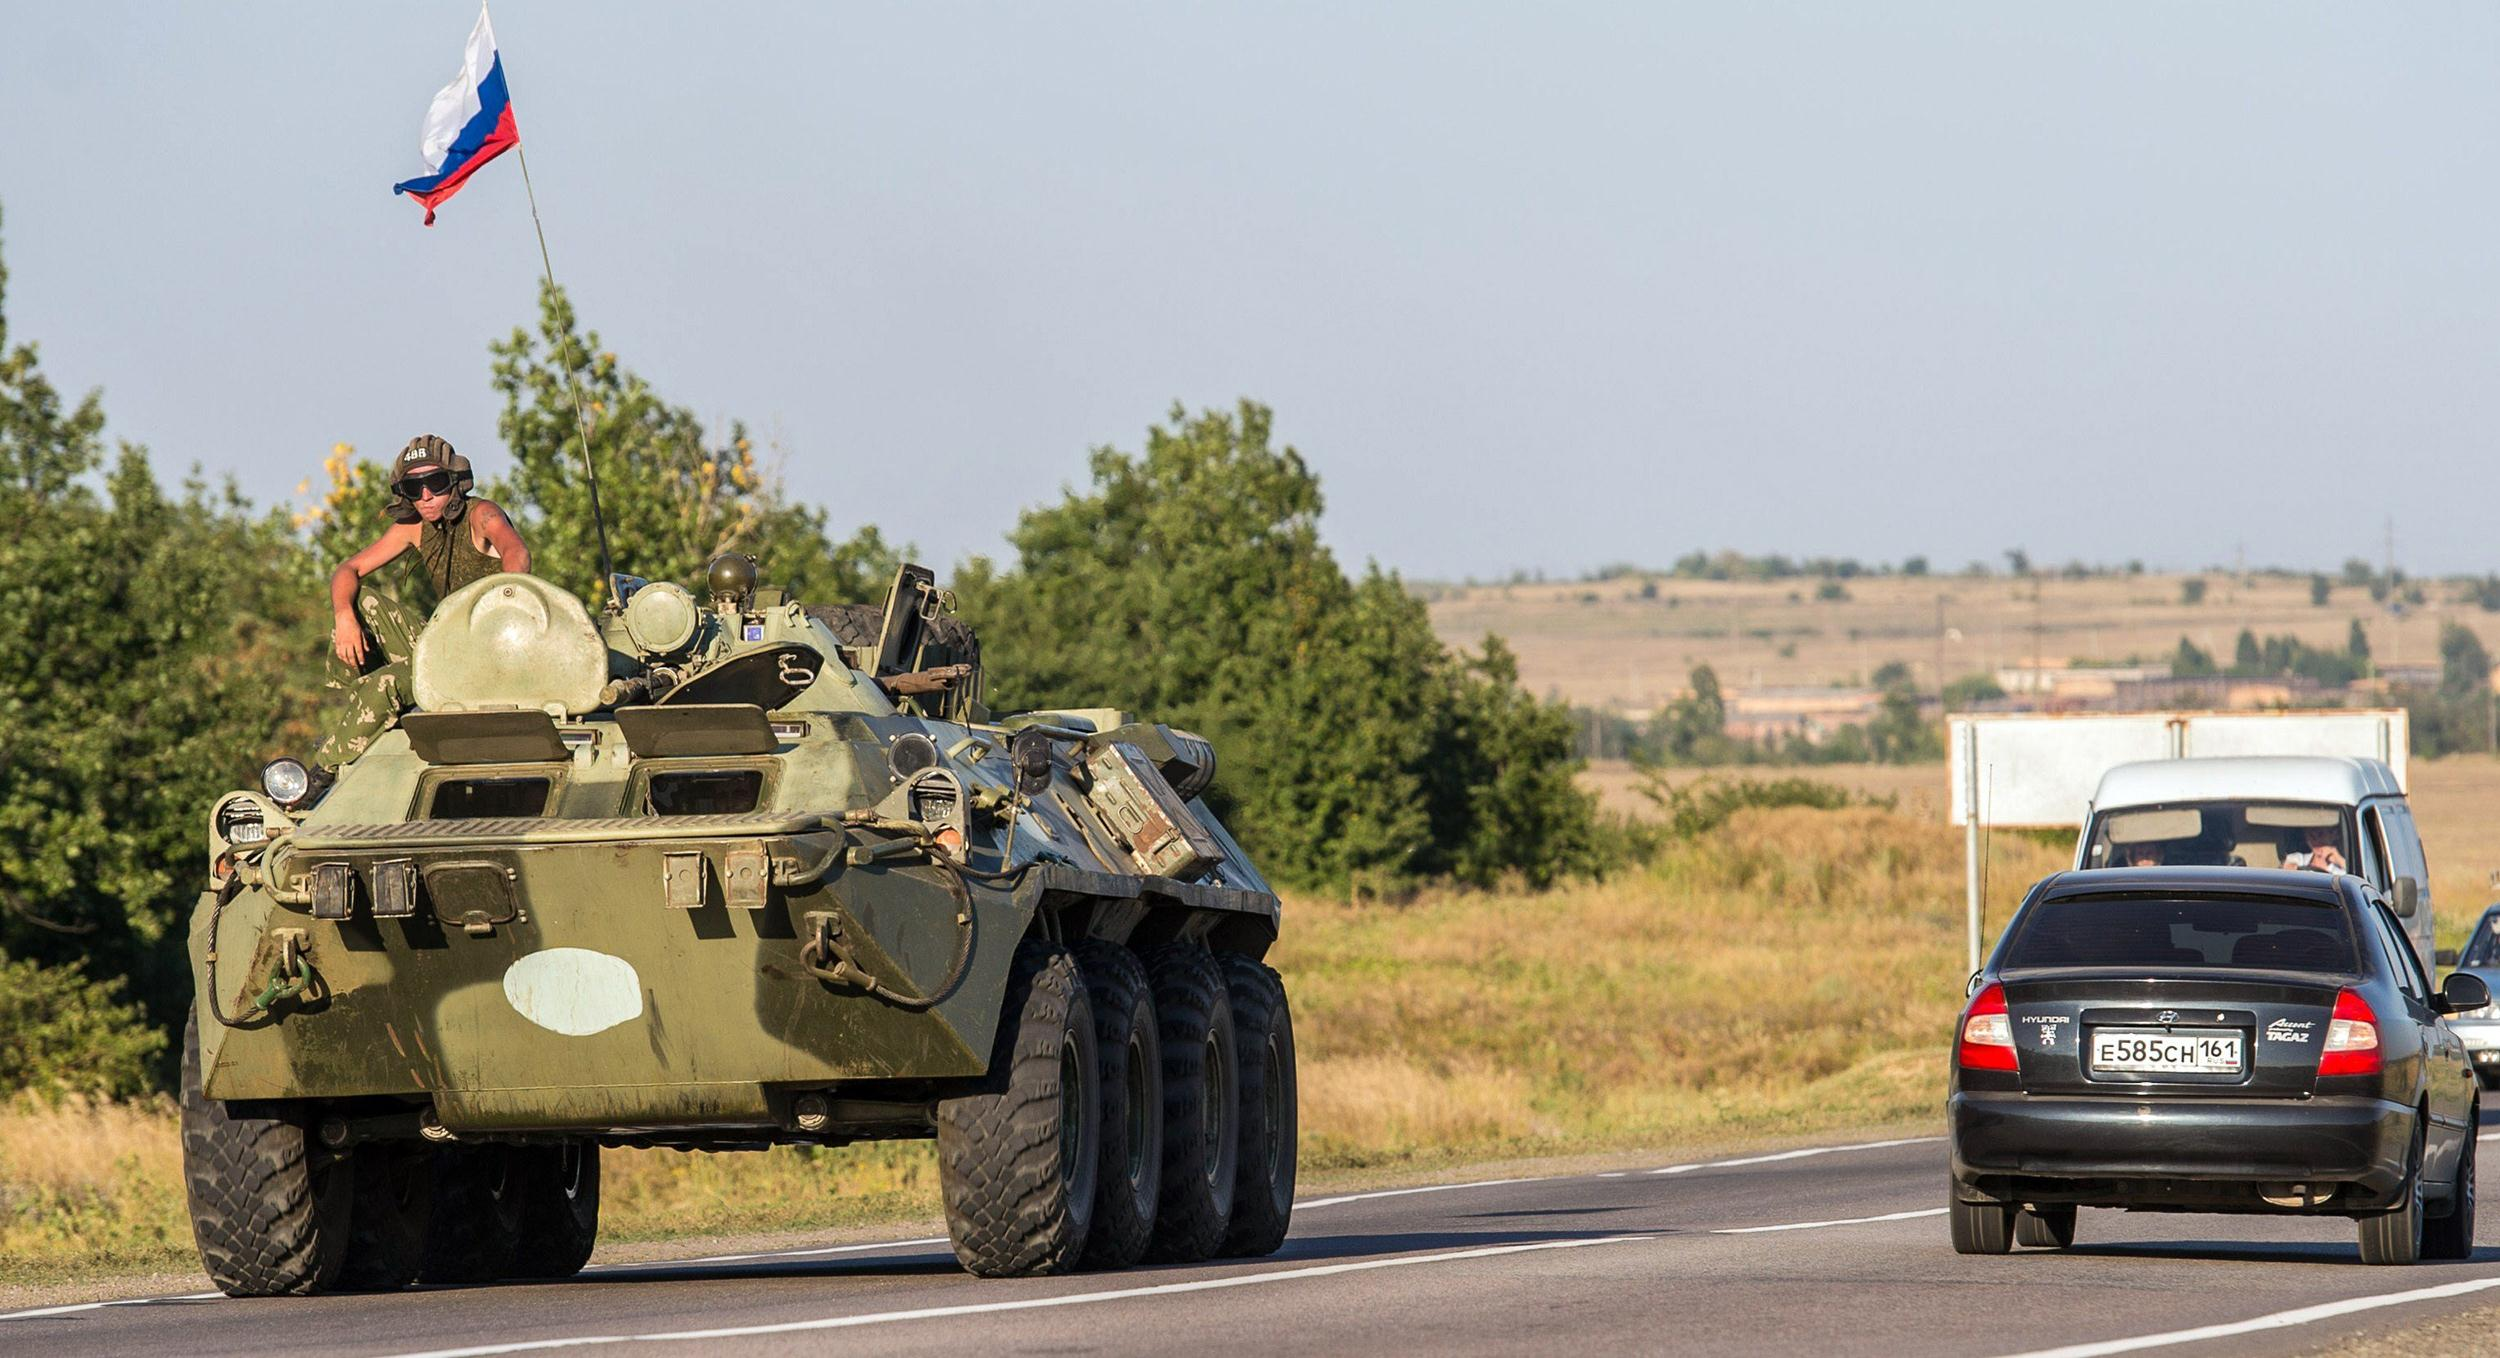 Image: RUSSIA-UKRAINE-CRISIS-MILITARY